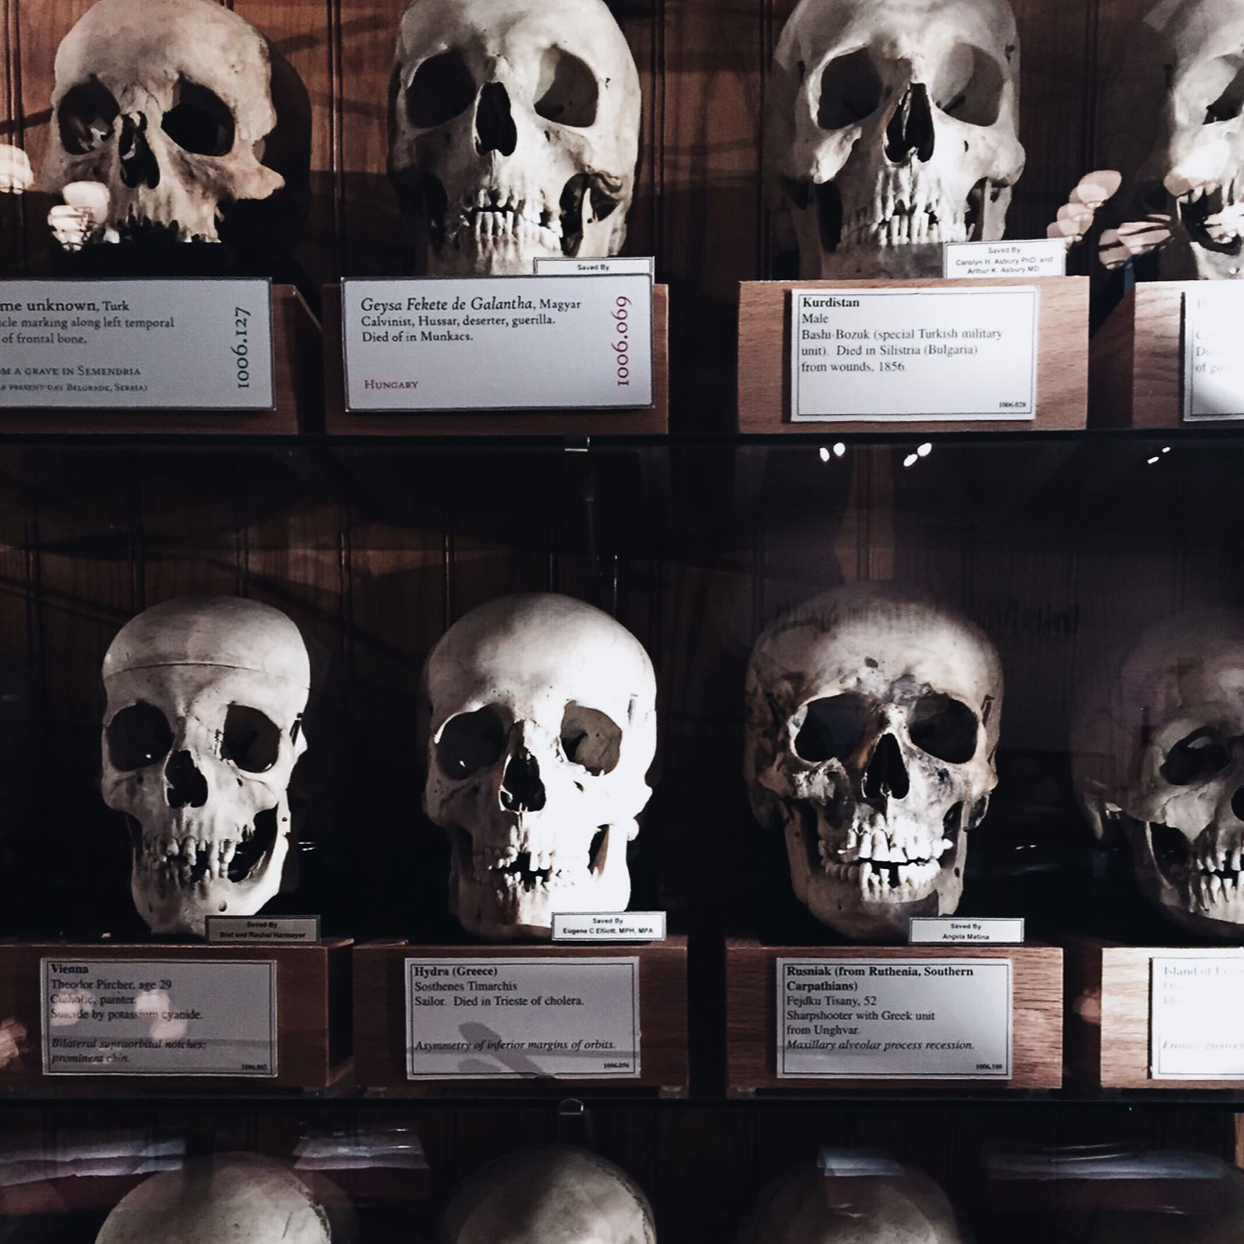 MÜTTER MUSEUM | TRAVEL  May 2015